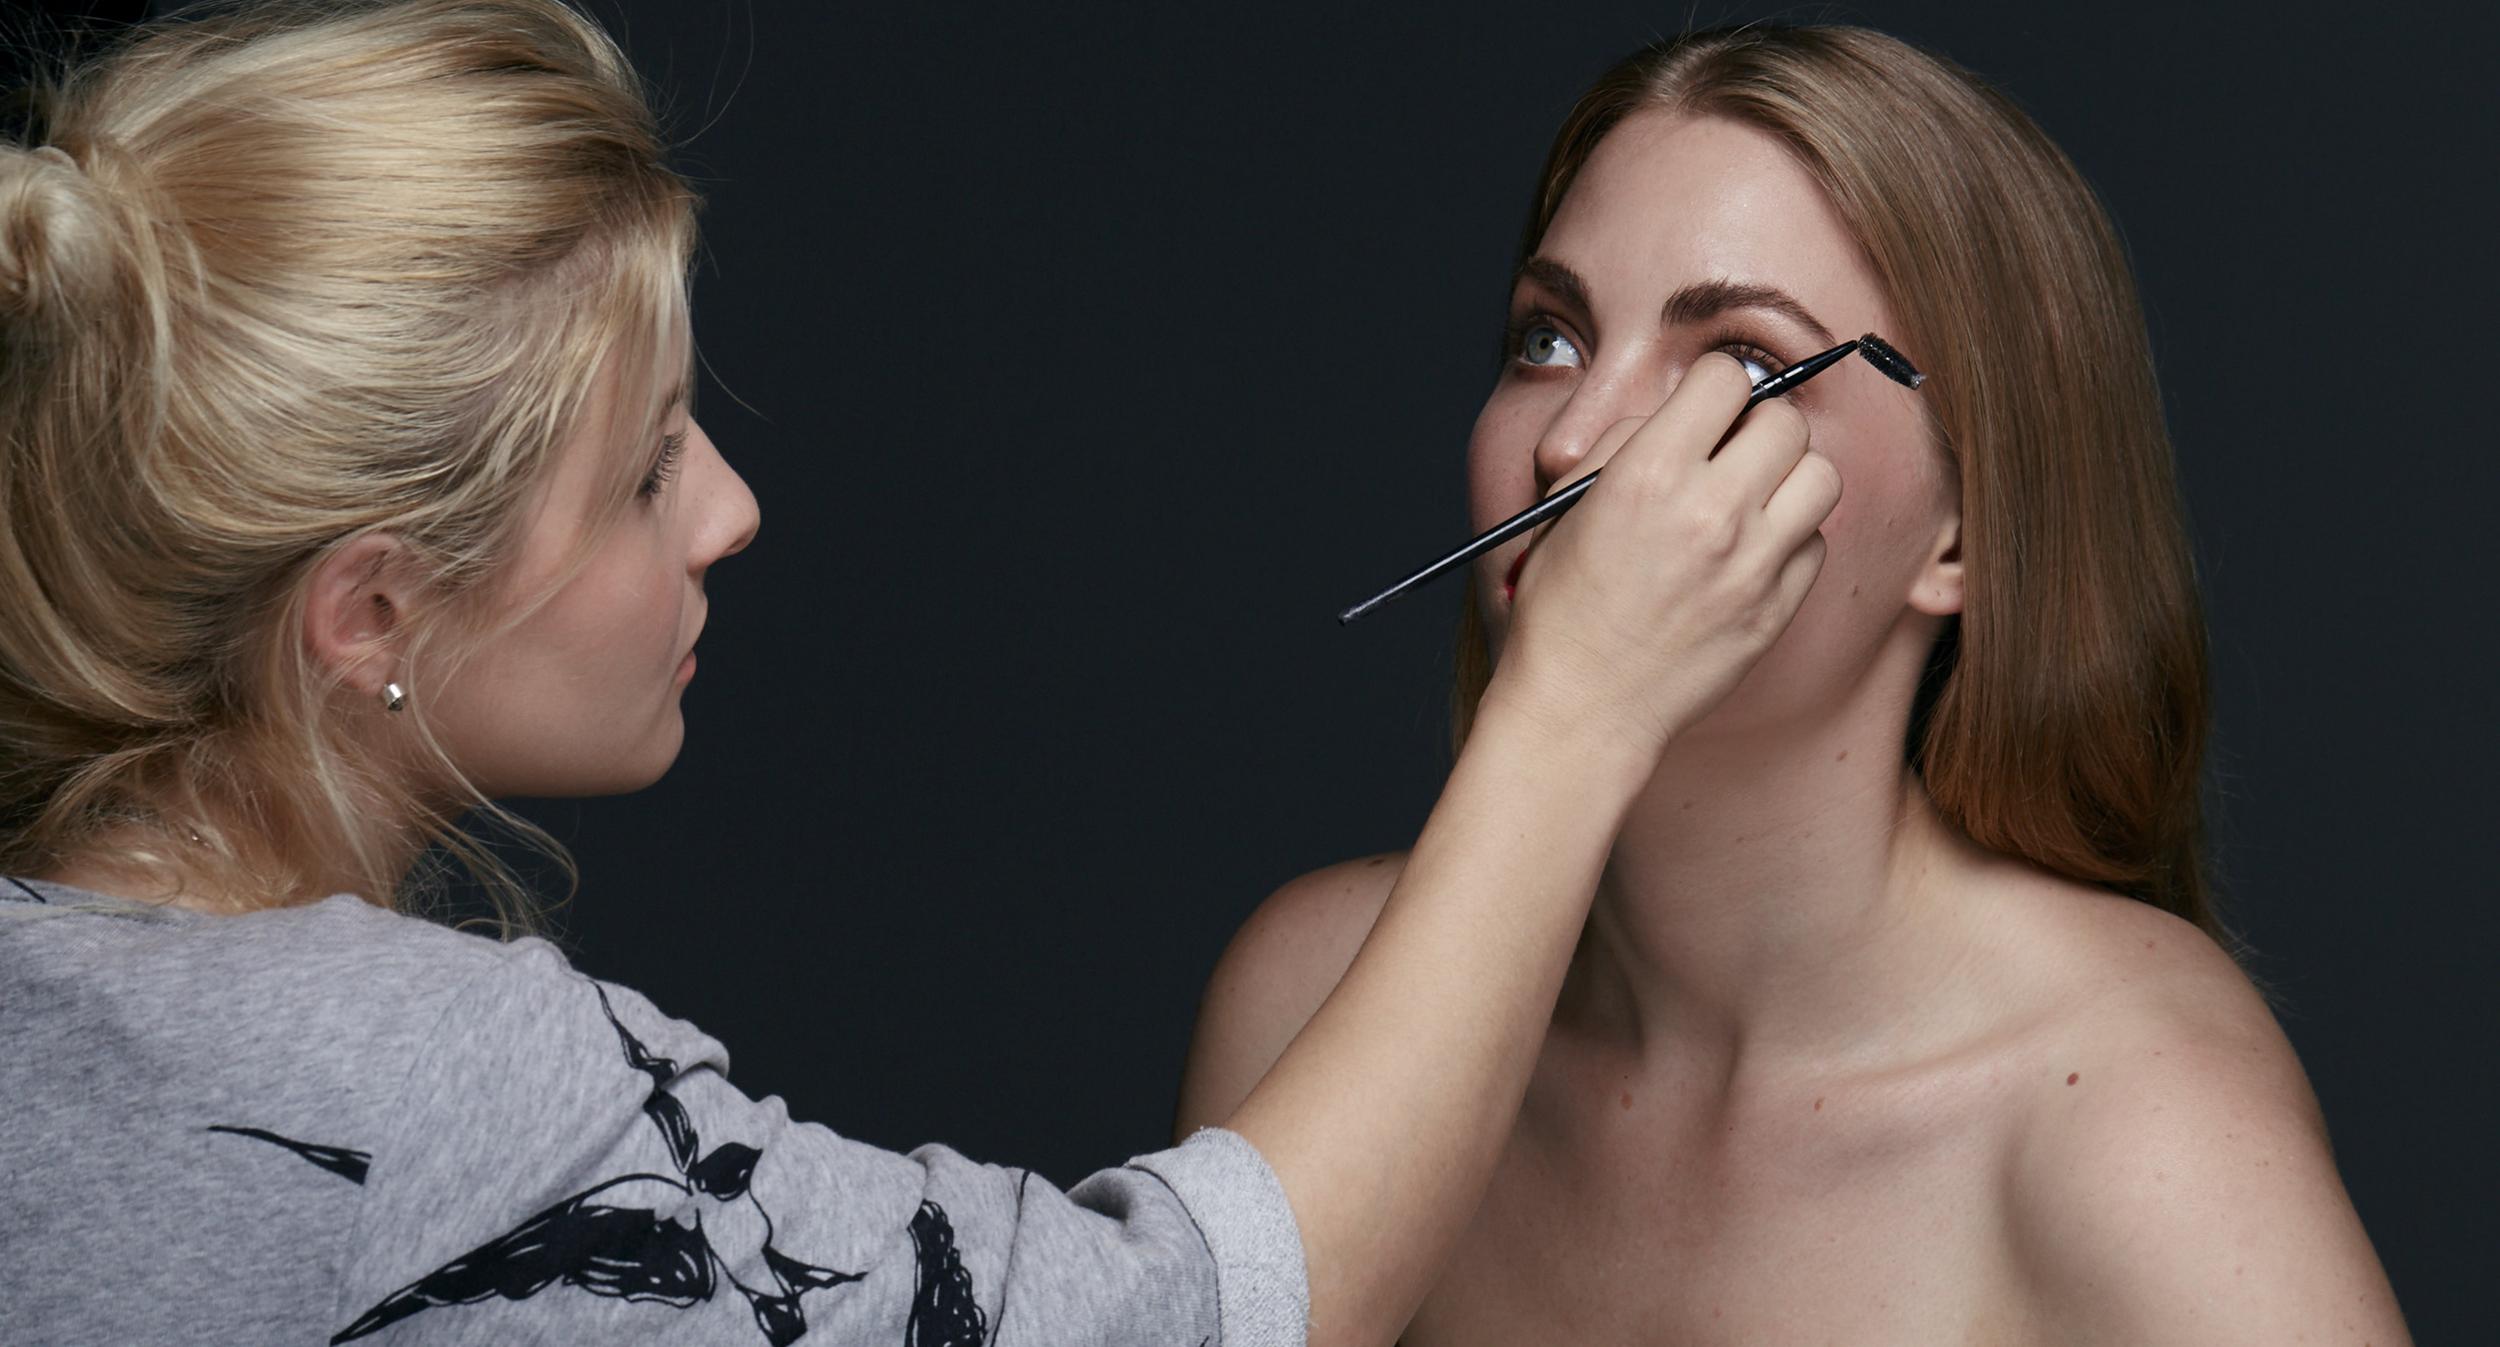 Madleina von Reding Making of3small.jpg